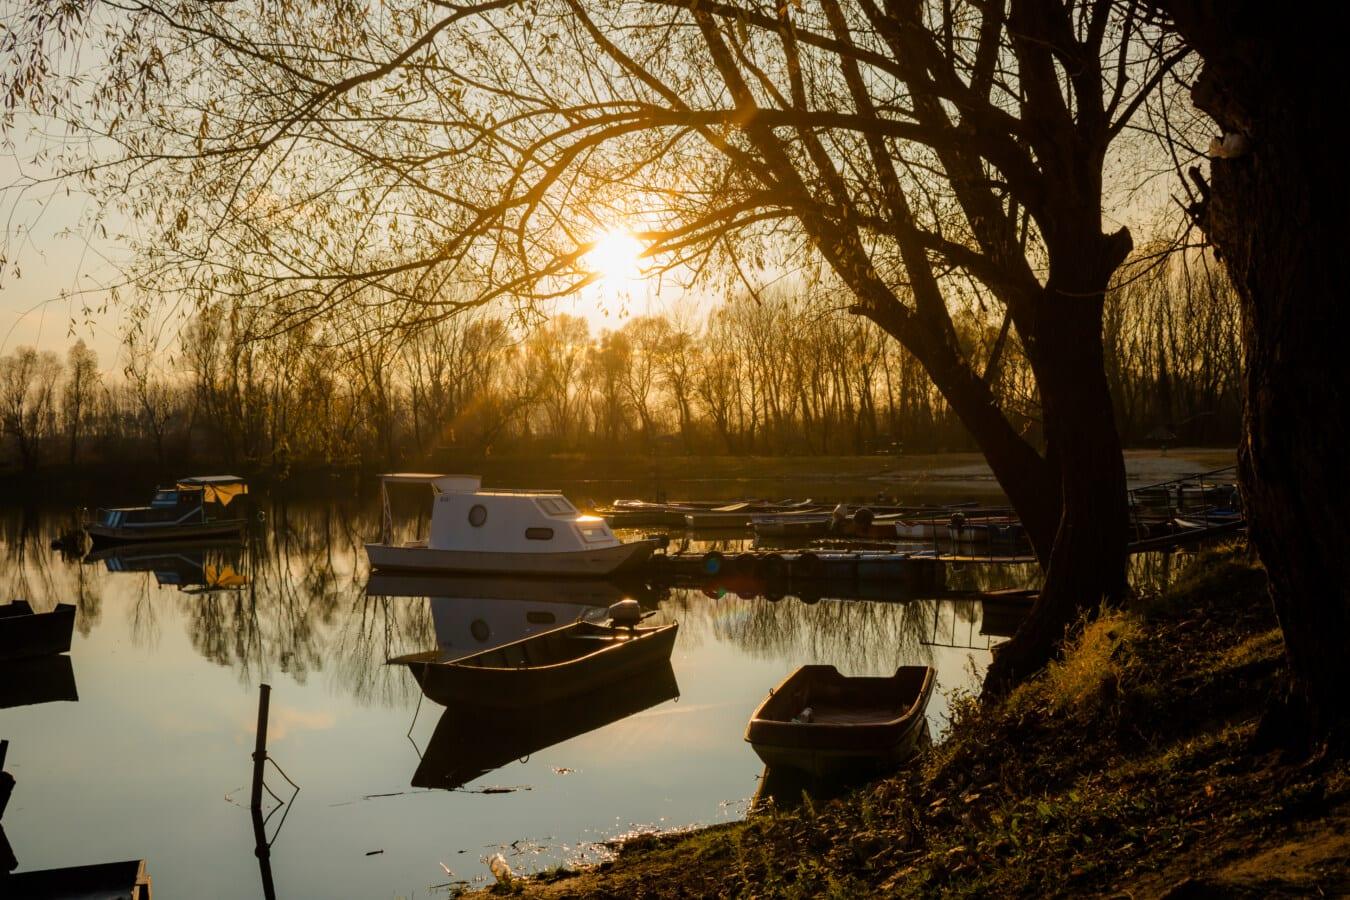 sunshine, sunset, harbour, yacht, sunrays, landscape, water, river, reflection, dawn